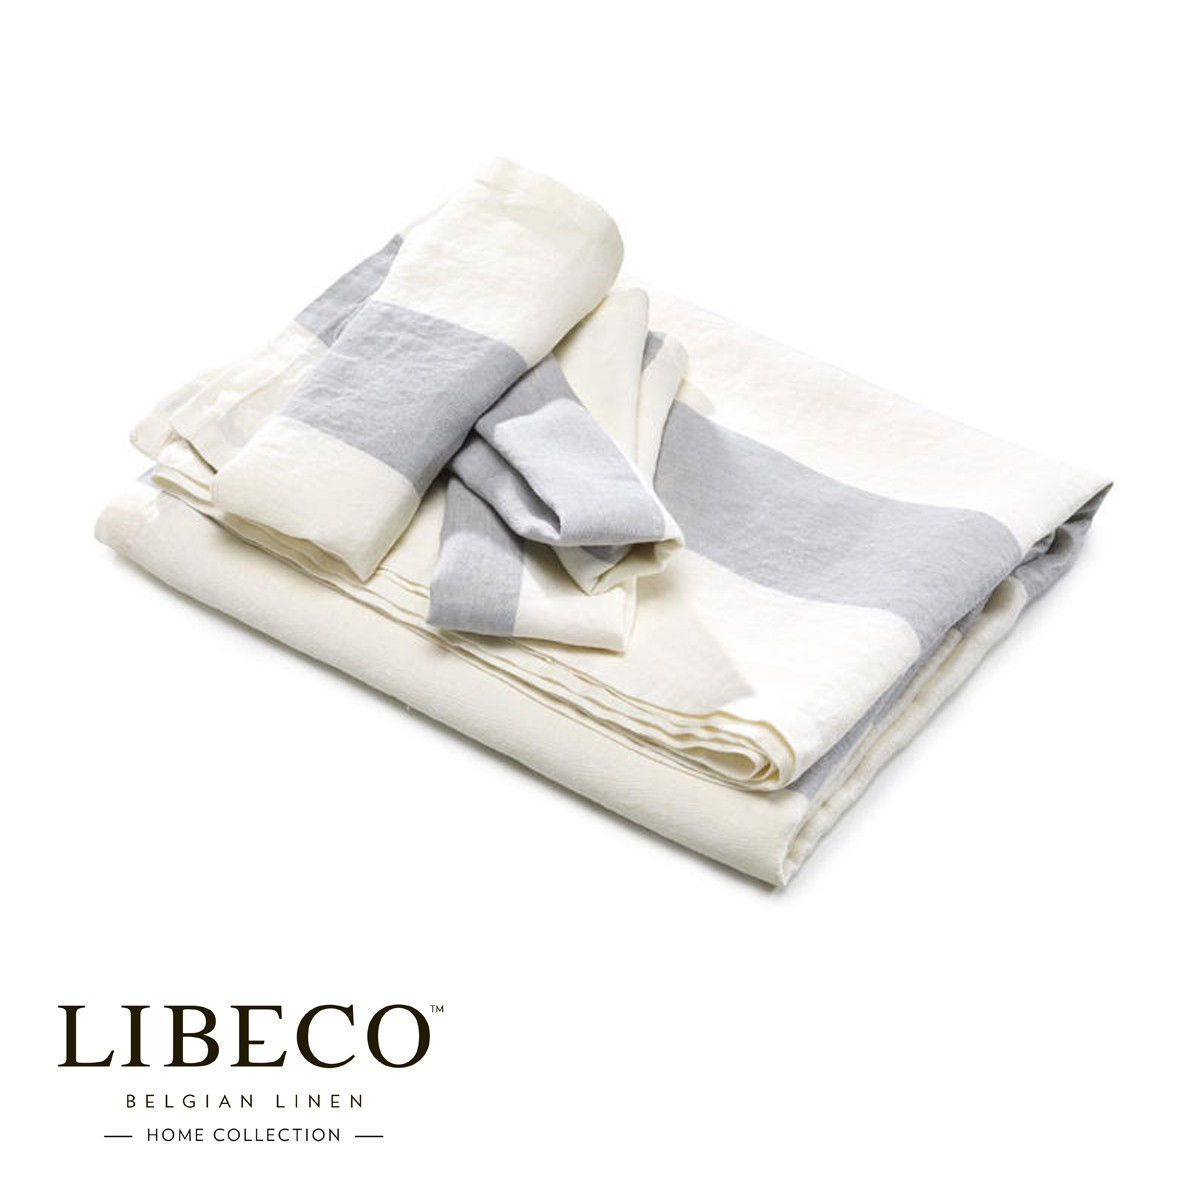 libeco tischdecke und l ufer long island. Black Bedroom Furniture Sets. Home Design Ideas